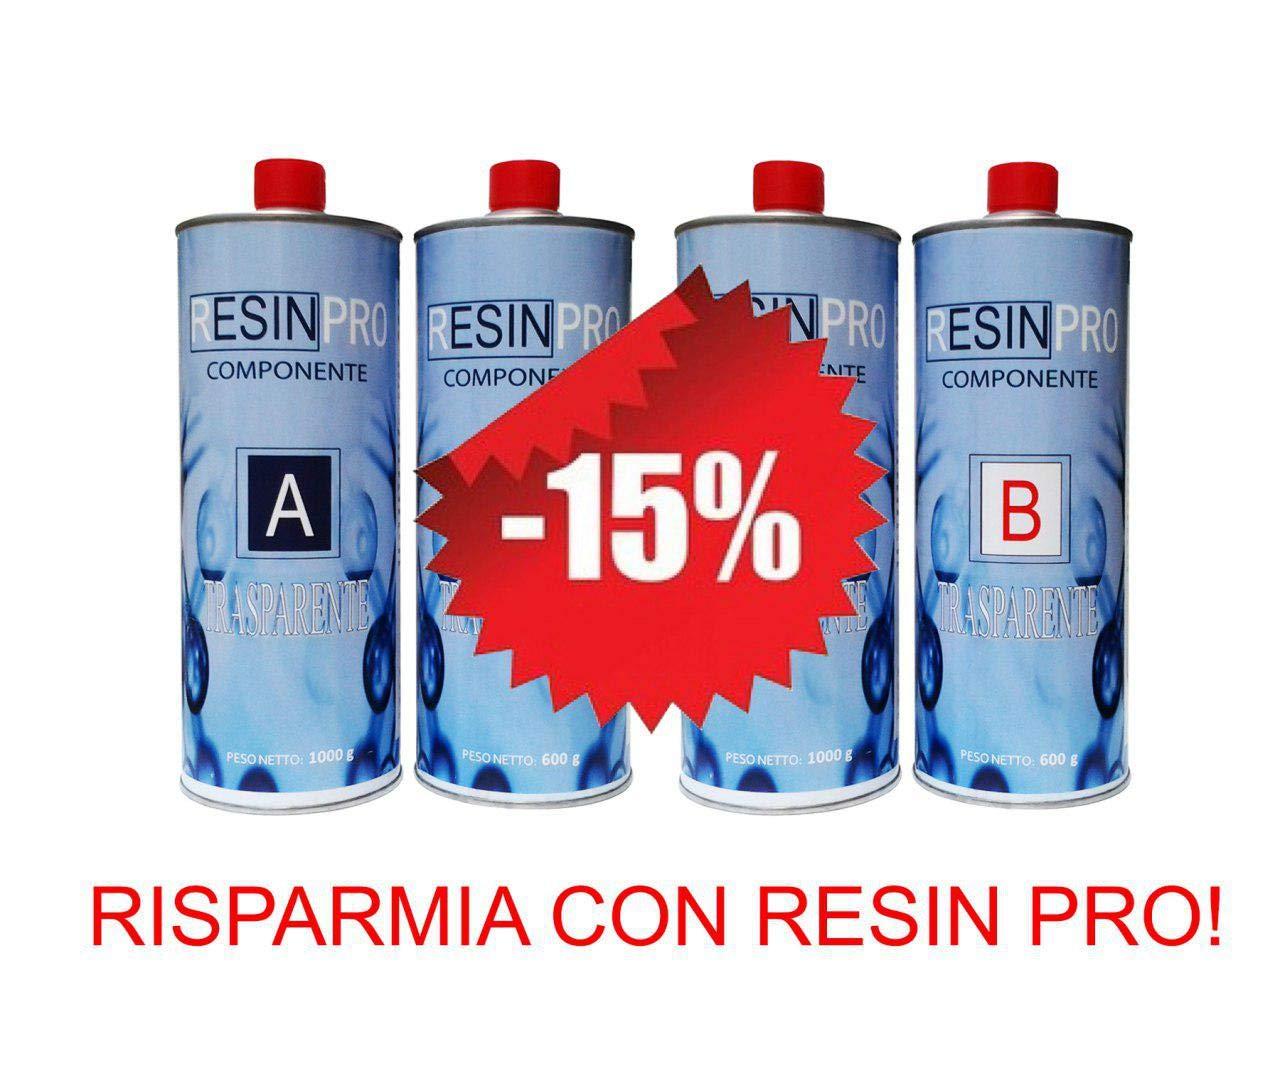 OFERTA ESPECIAL (1.6 KG + 1.6 KG) - SET - RESINA EPOXIA TRANSPARENTE / MULTIUSOS KG 3.2 Resin Pro QF-WDO4-YKP9